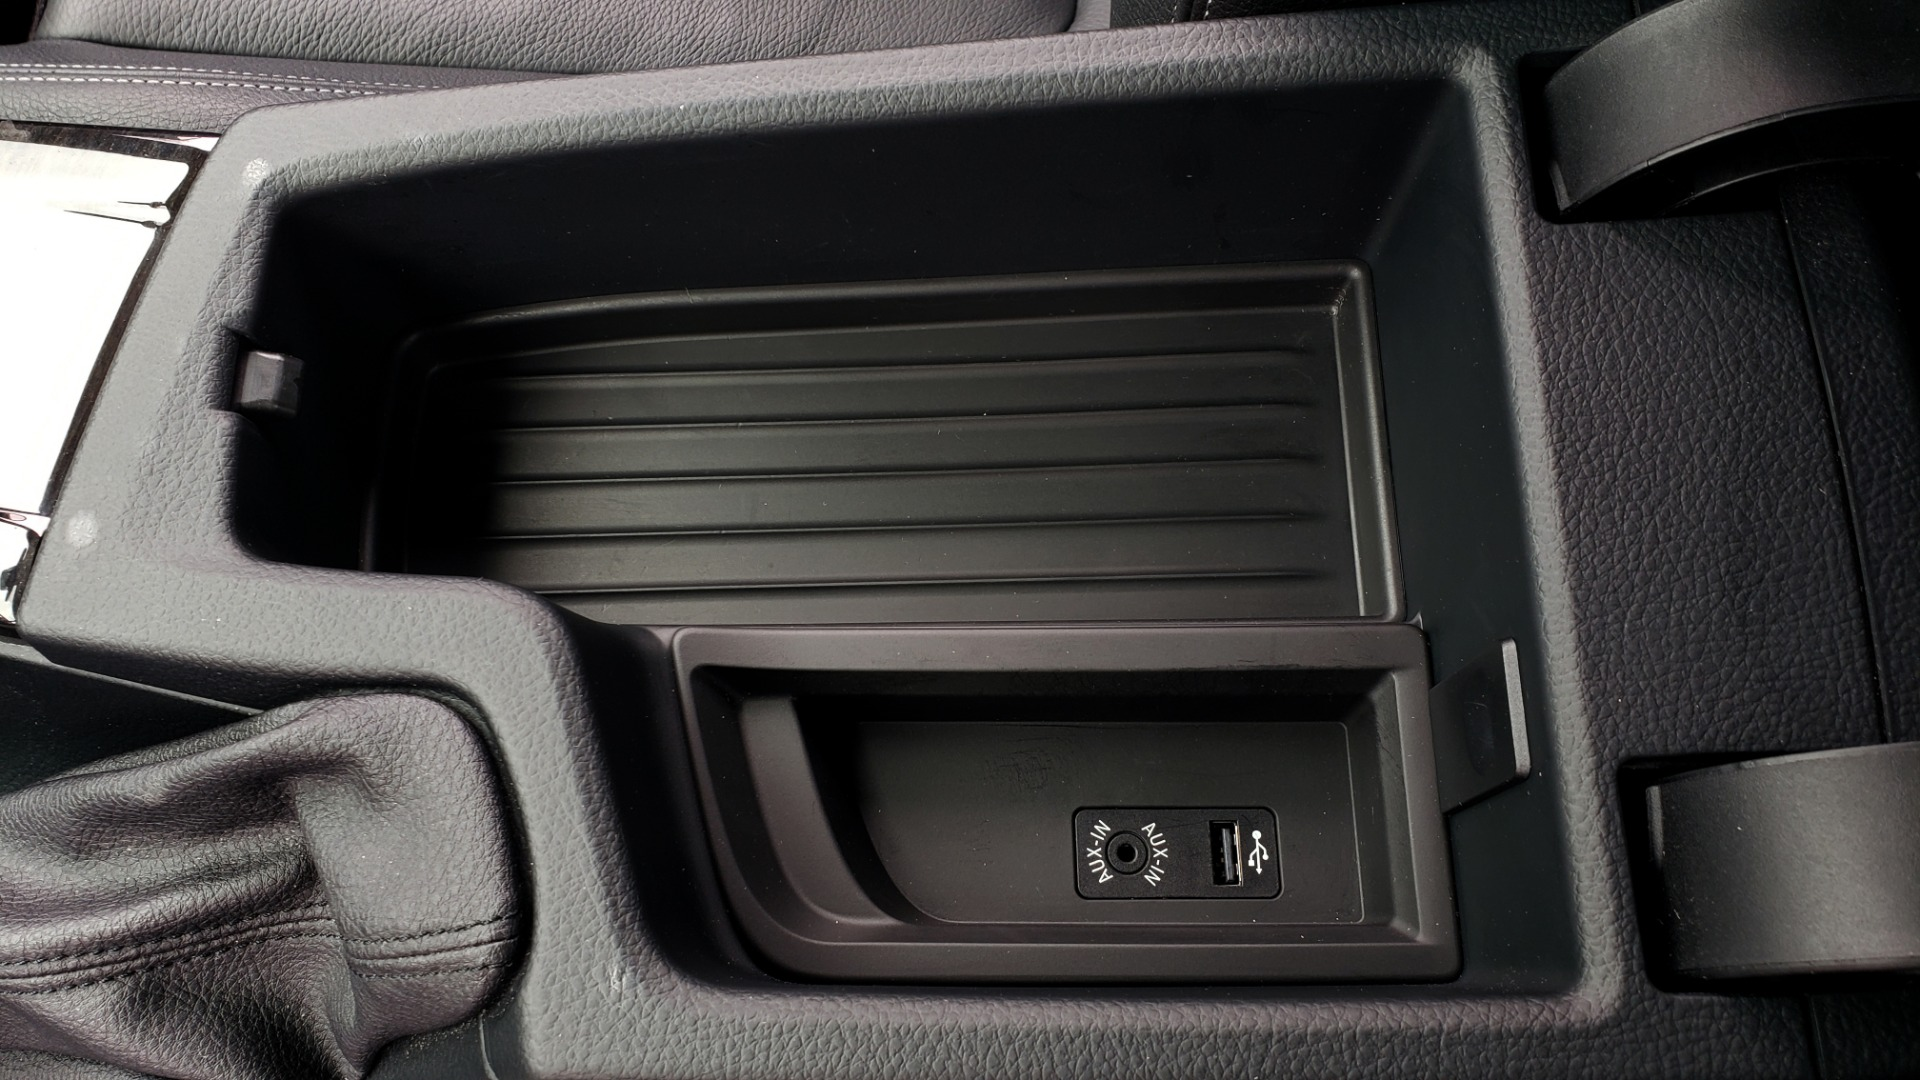 Used 2016 BMW 3 SERIES 328I PREMIUM PKG / DRVR ASST / SUNROOF / PARK ASST for sale Sold at Formula Imports in Charlotte NC 28227 53